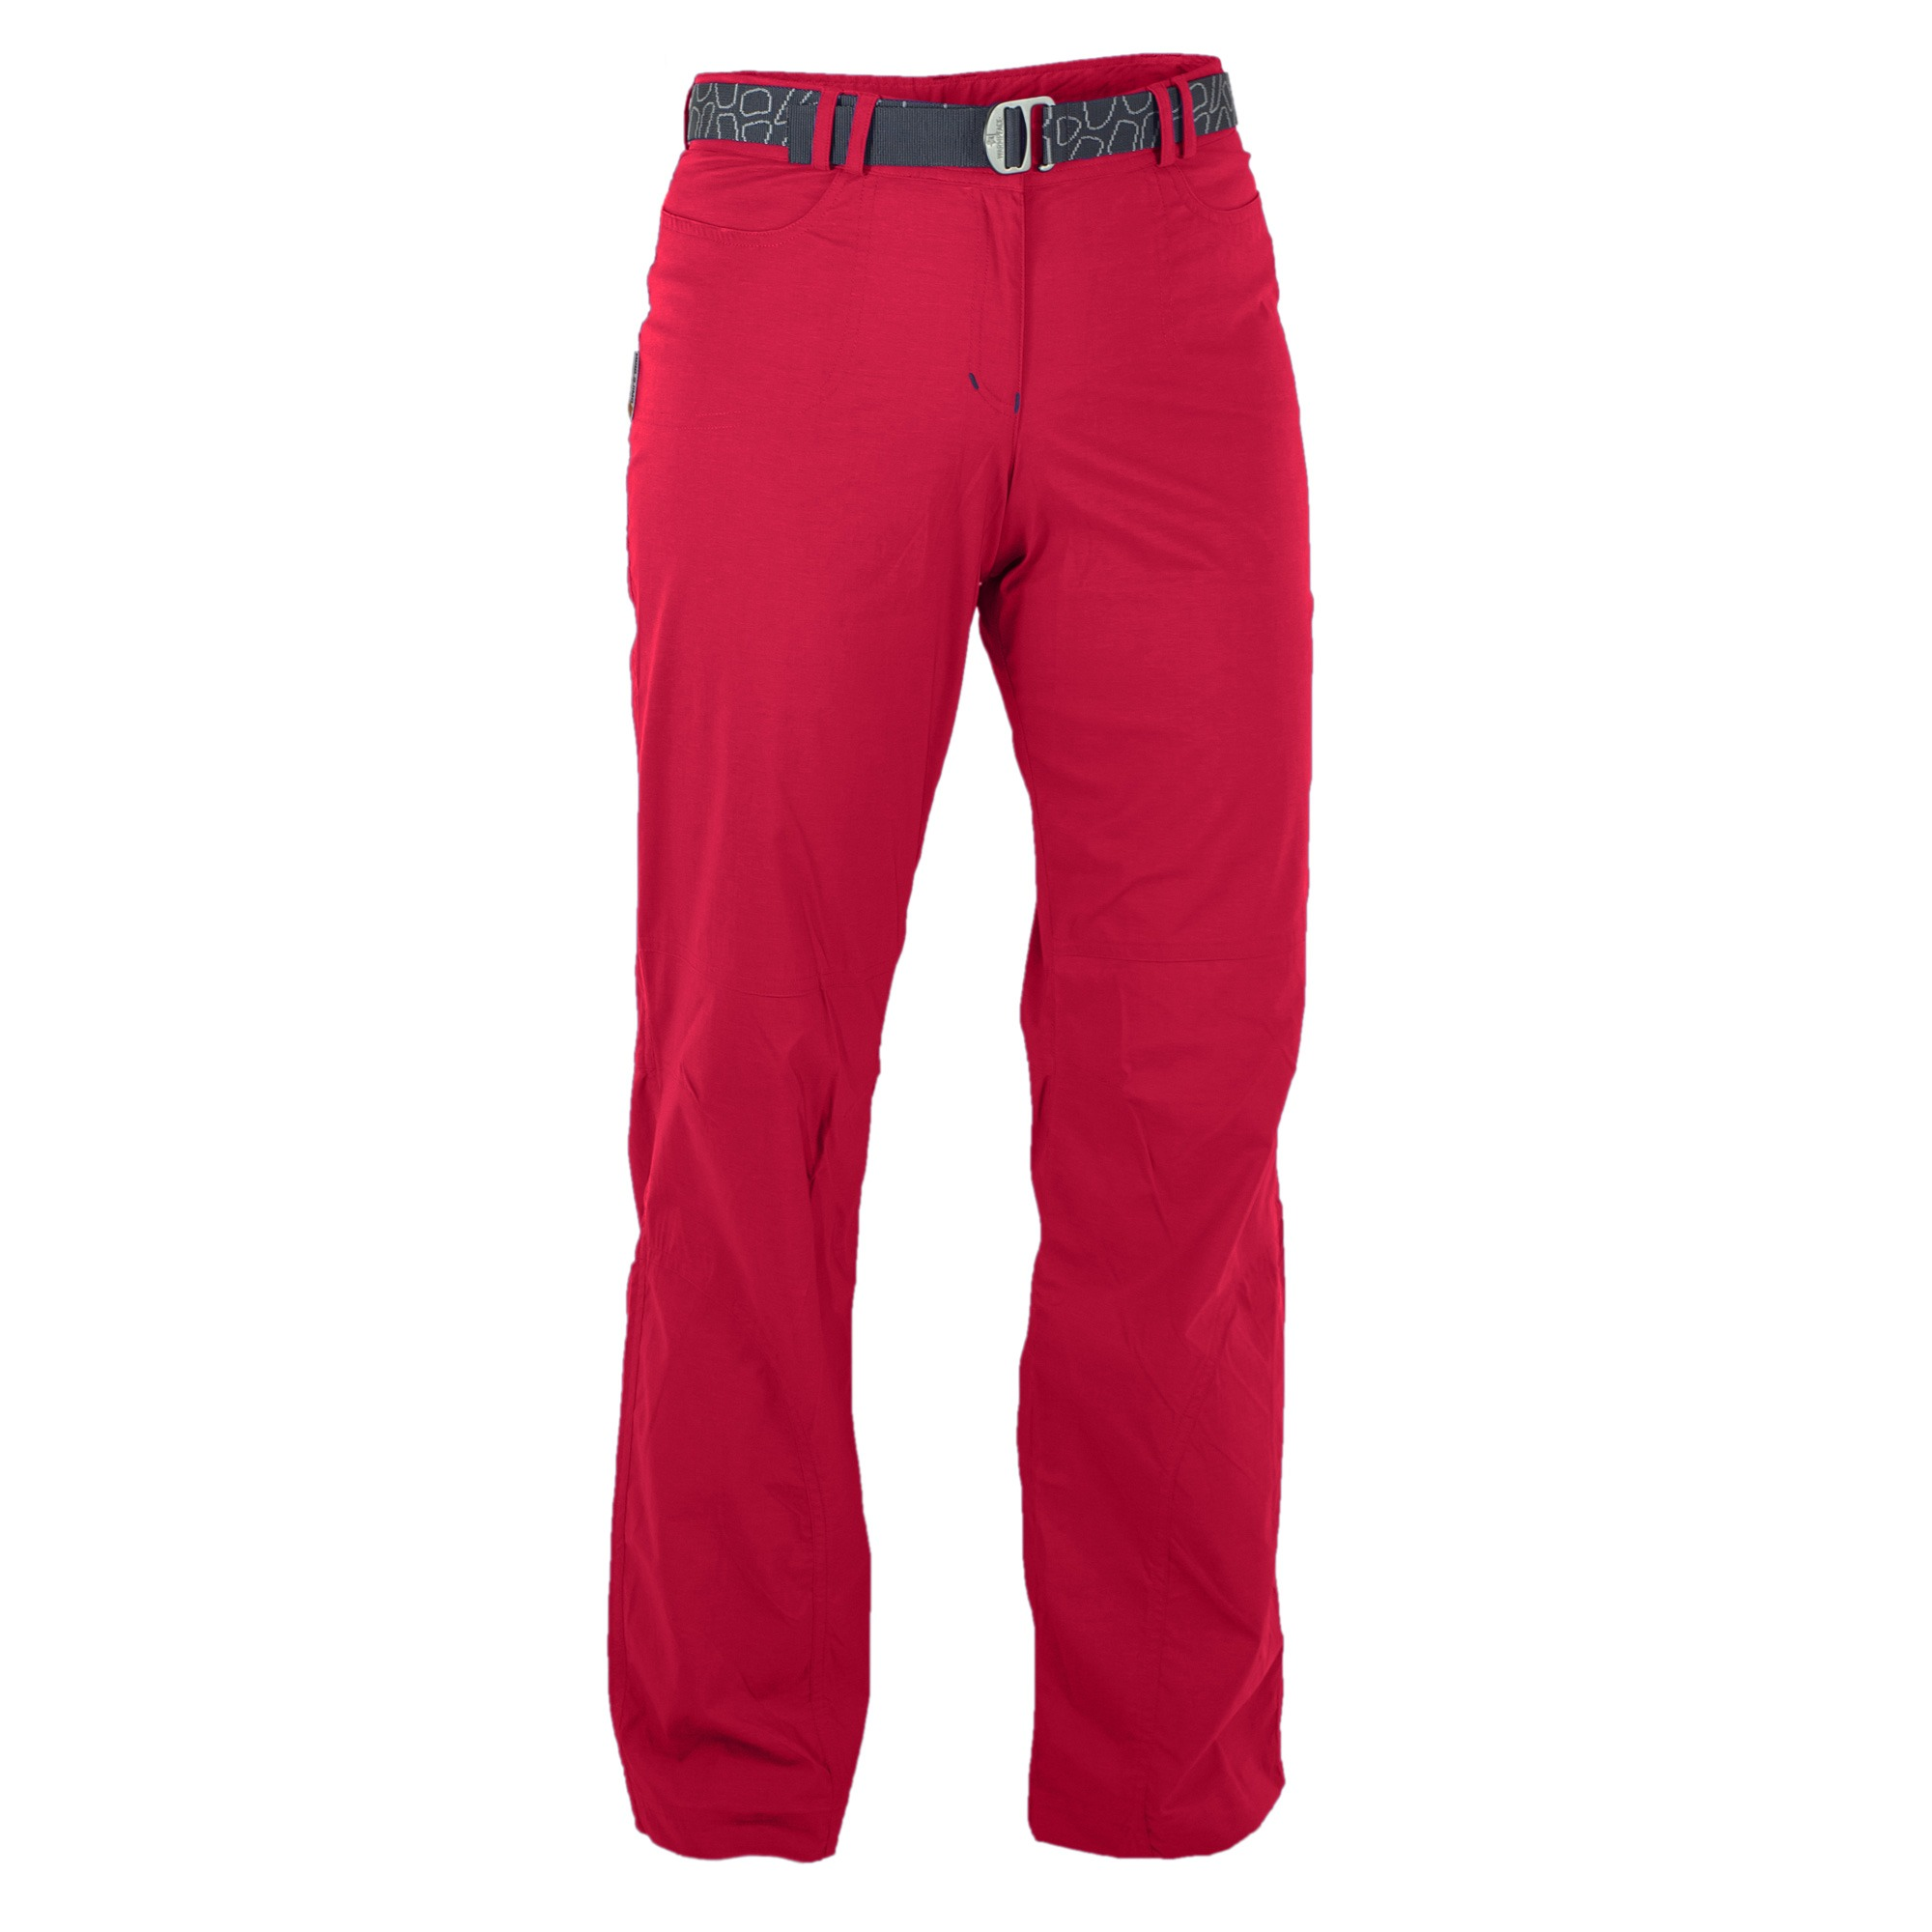 Pantaloni Trekking Warmpeace Astoria Lady - Rosu